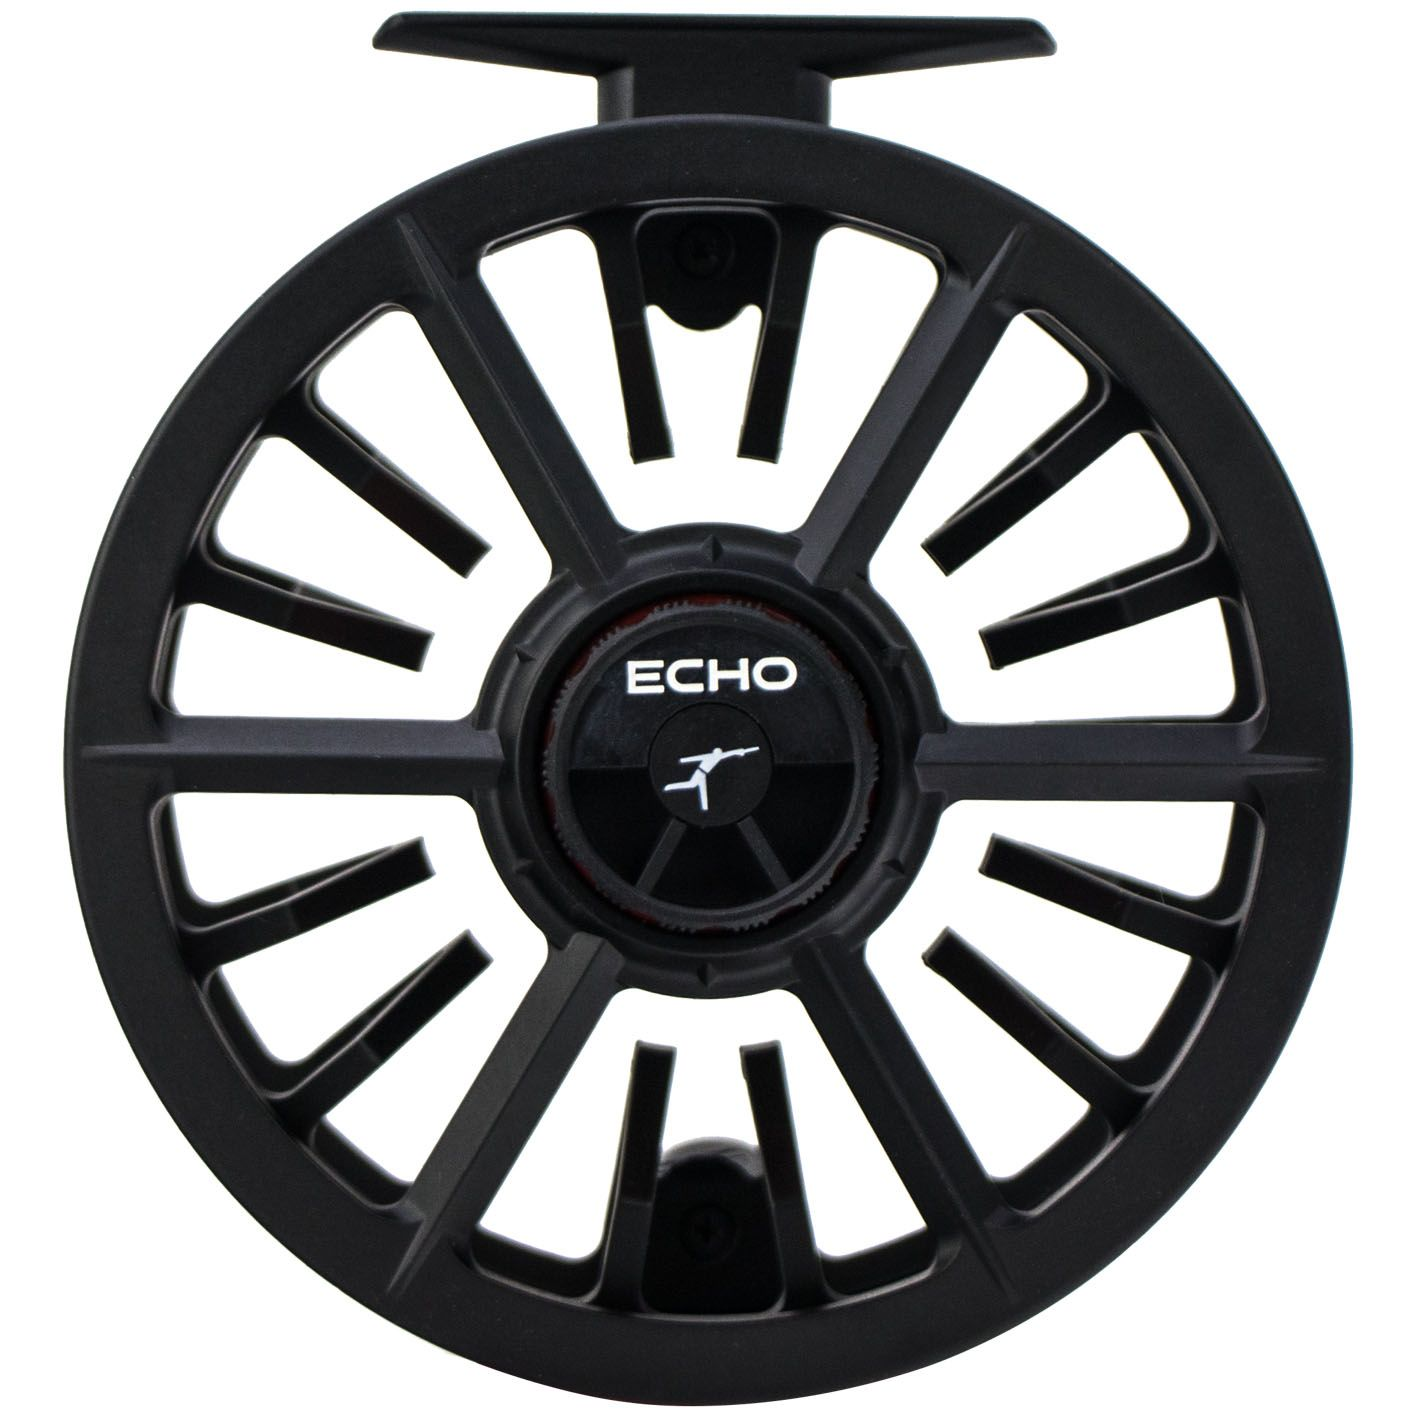 Carretilha de Fly ECHO Bravo, Alumínio, Freio Selado, Super Robusta